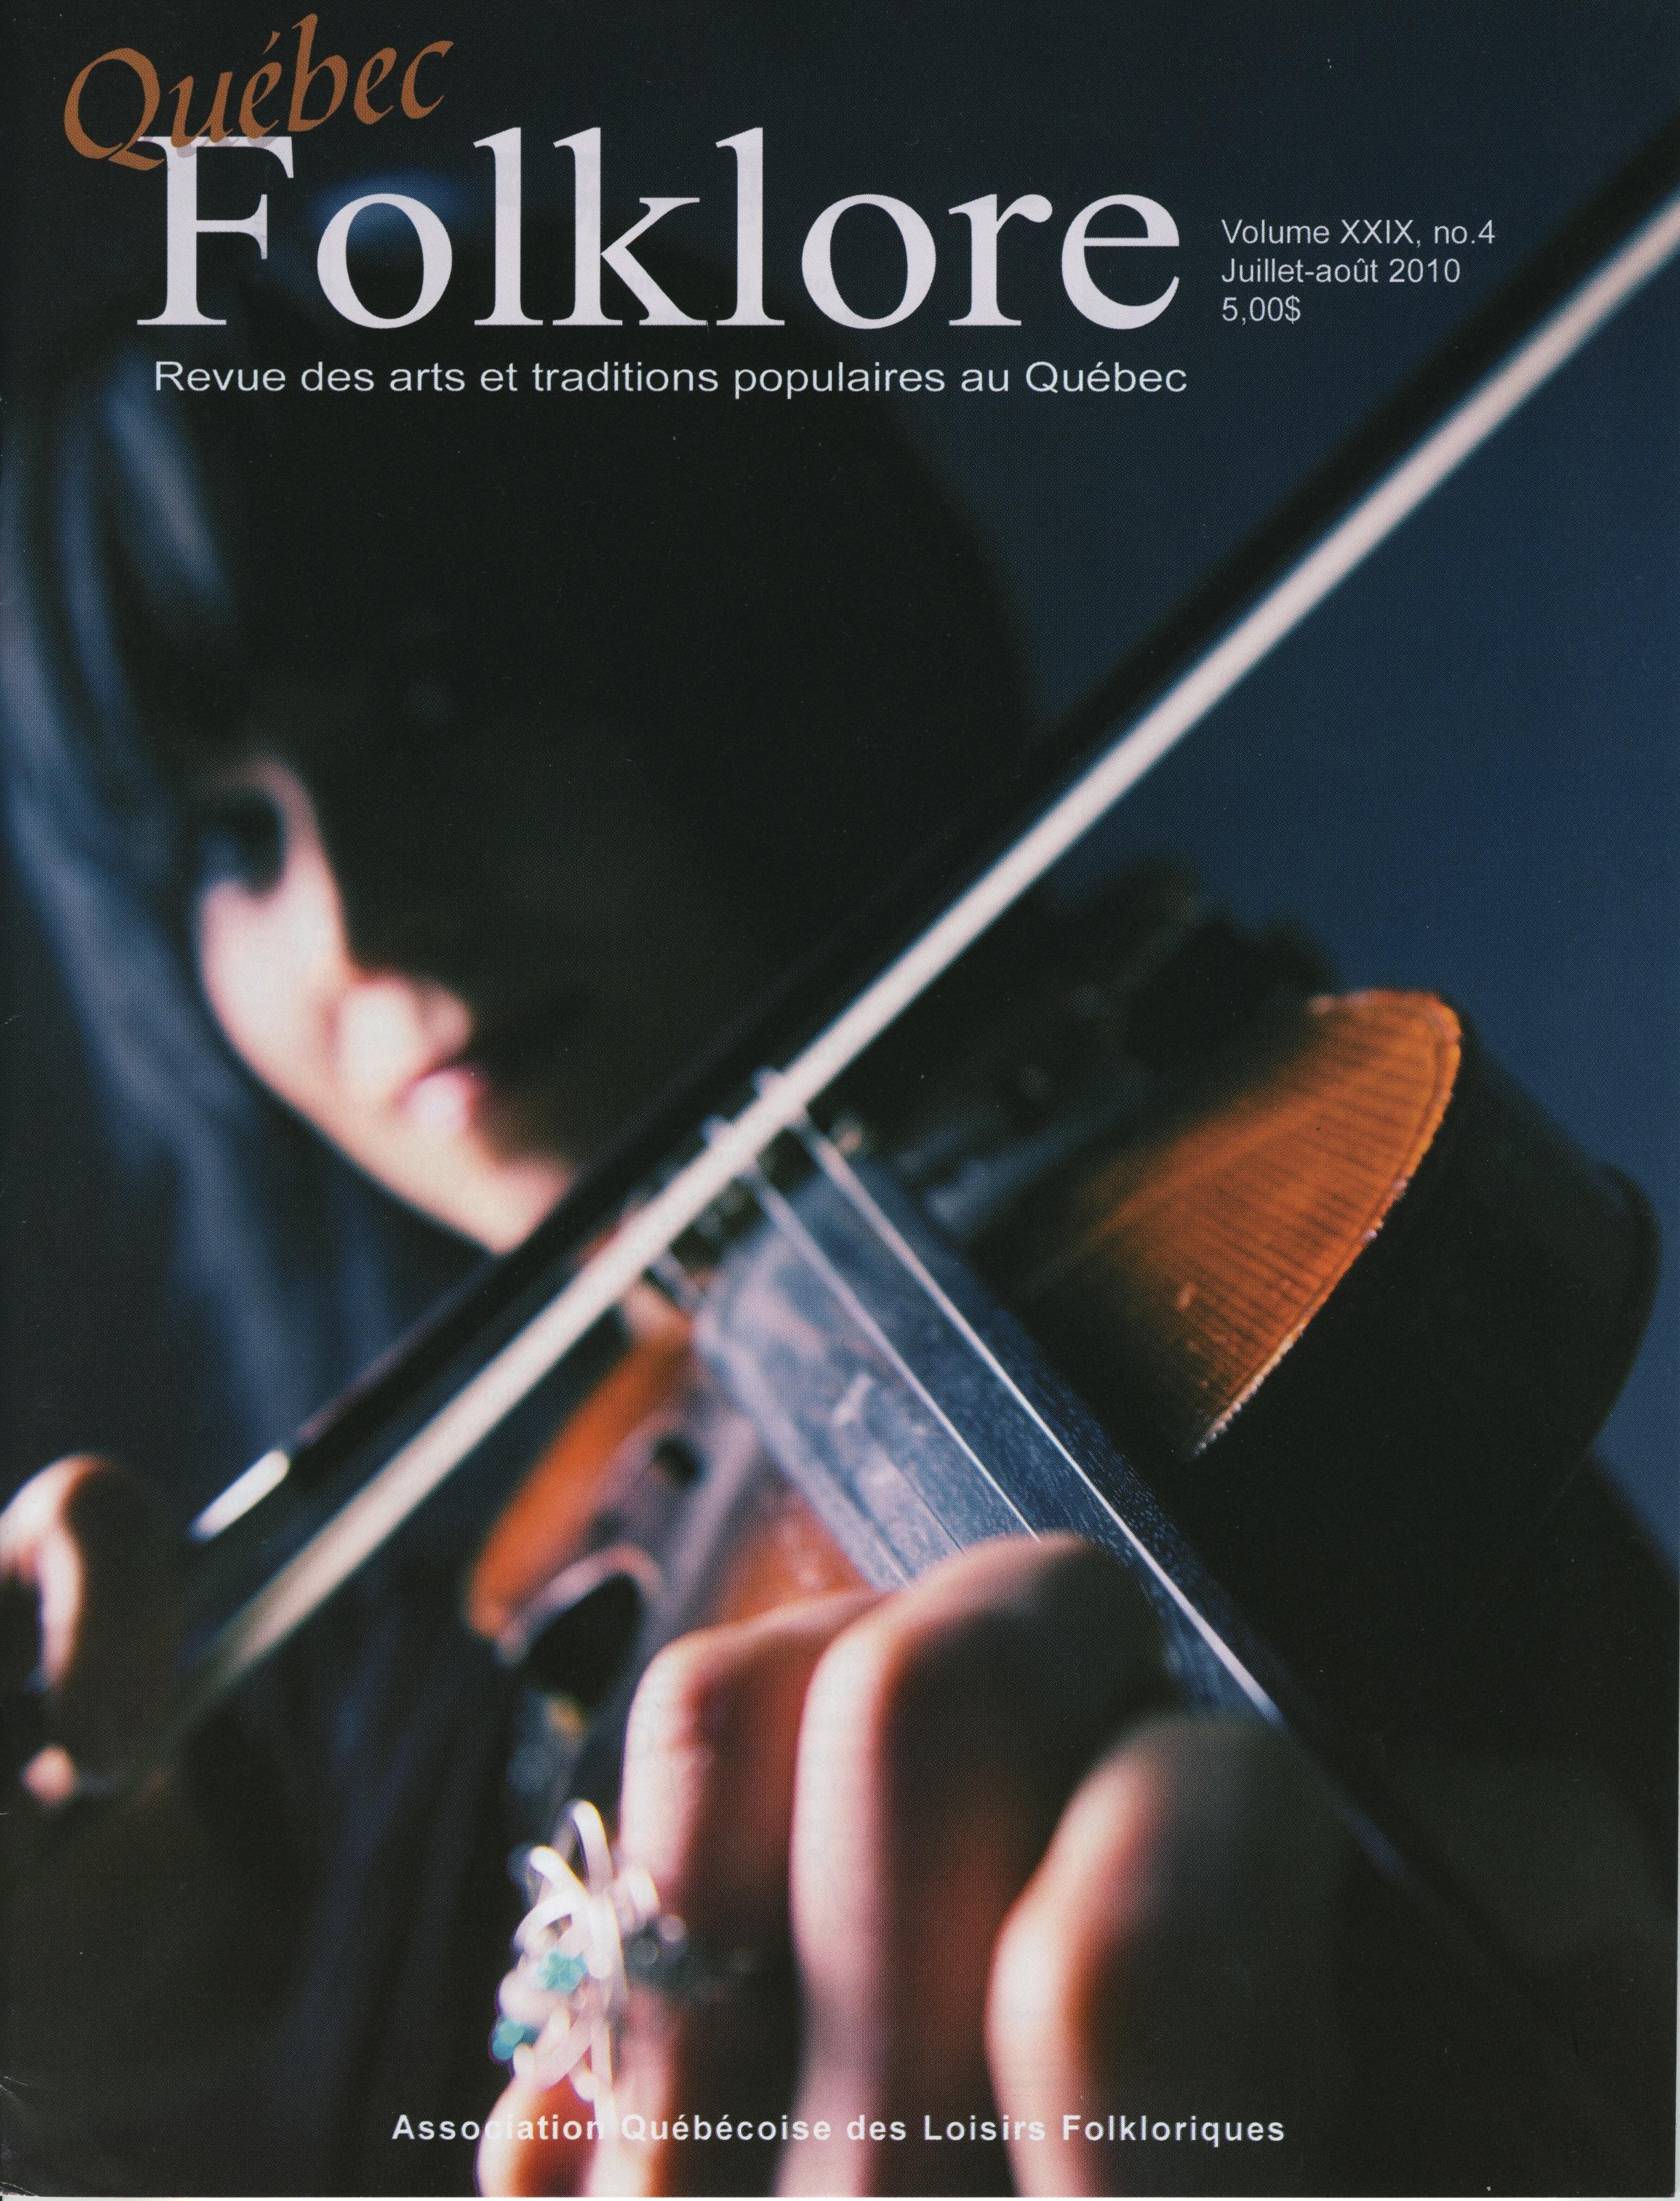 Québec Folklore, Juillet-août 2010